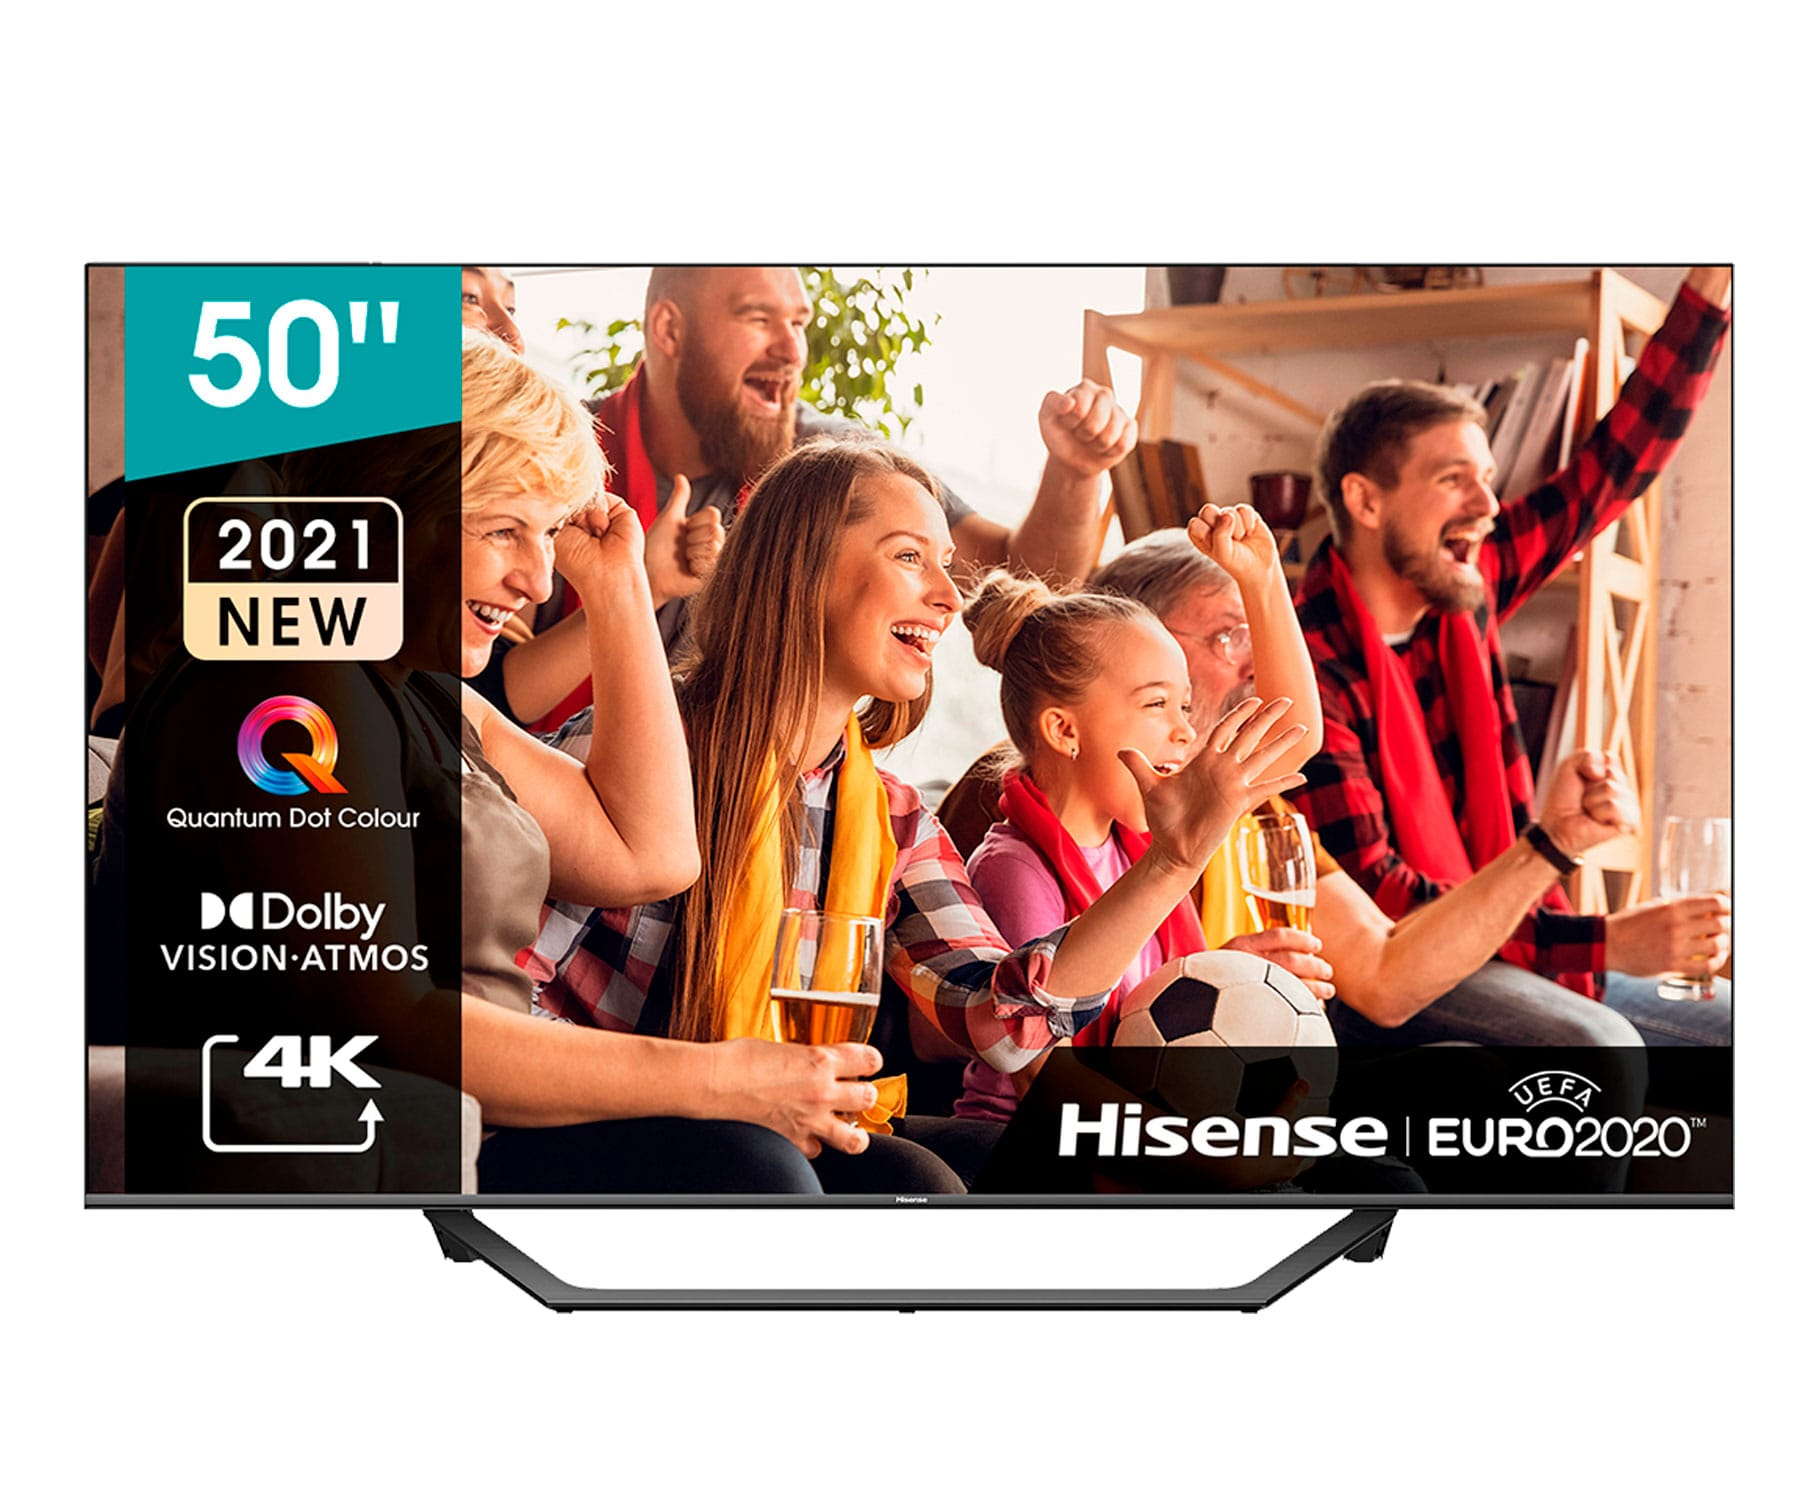 Hisense H50A7GQ TV 50''/4K UHD/Smart TV/HDR/WiFi/Bluetooth